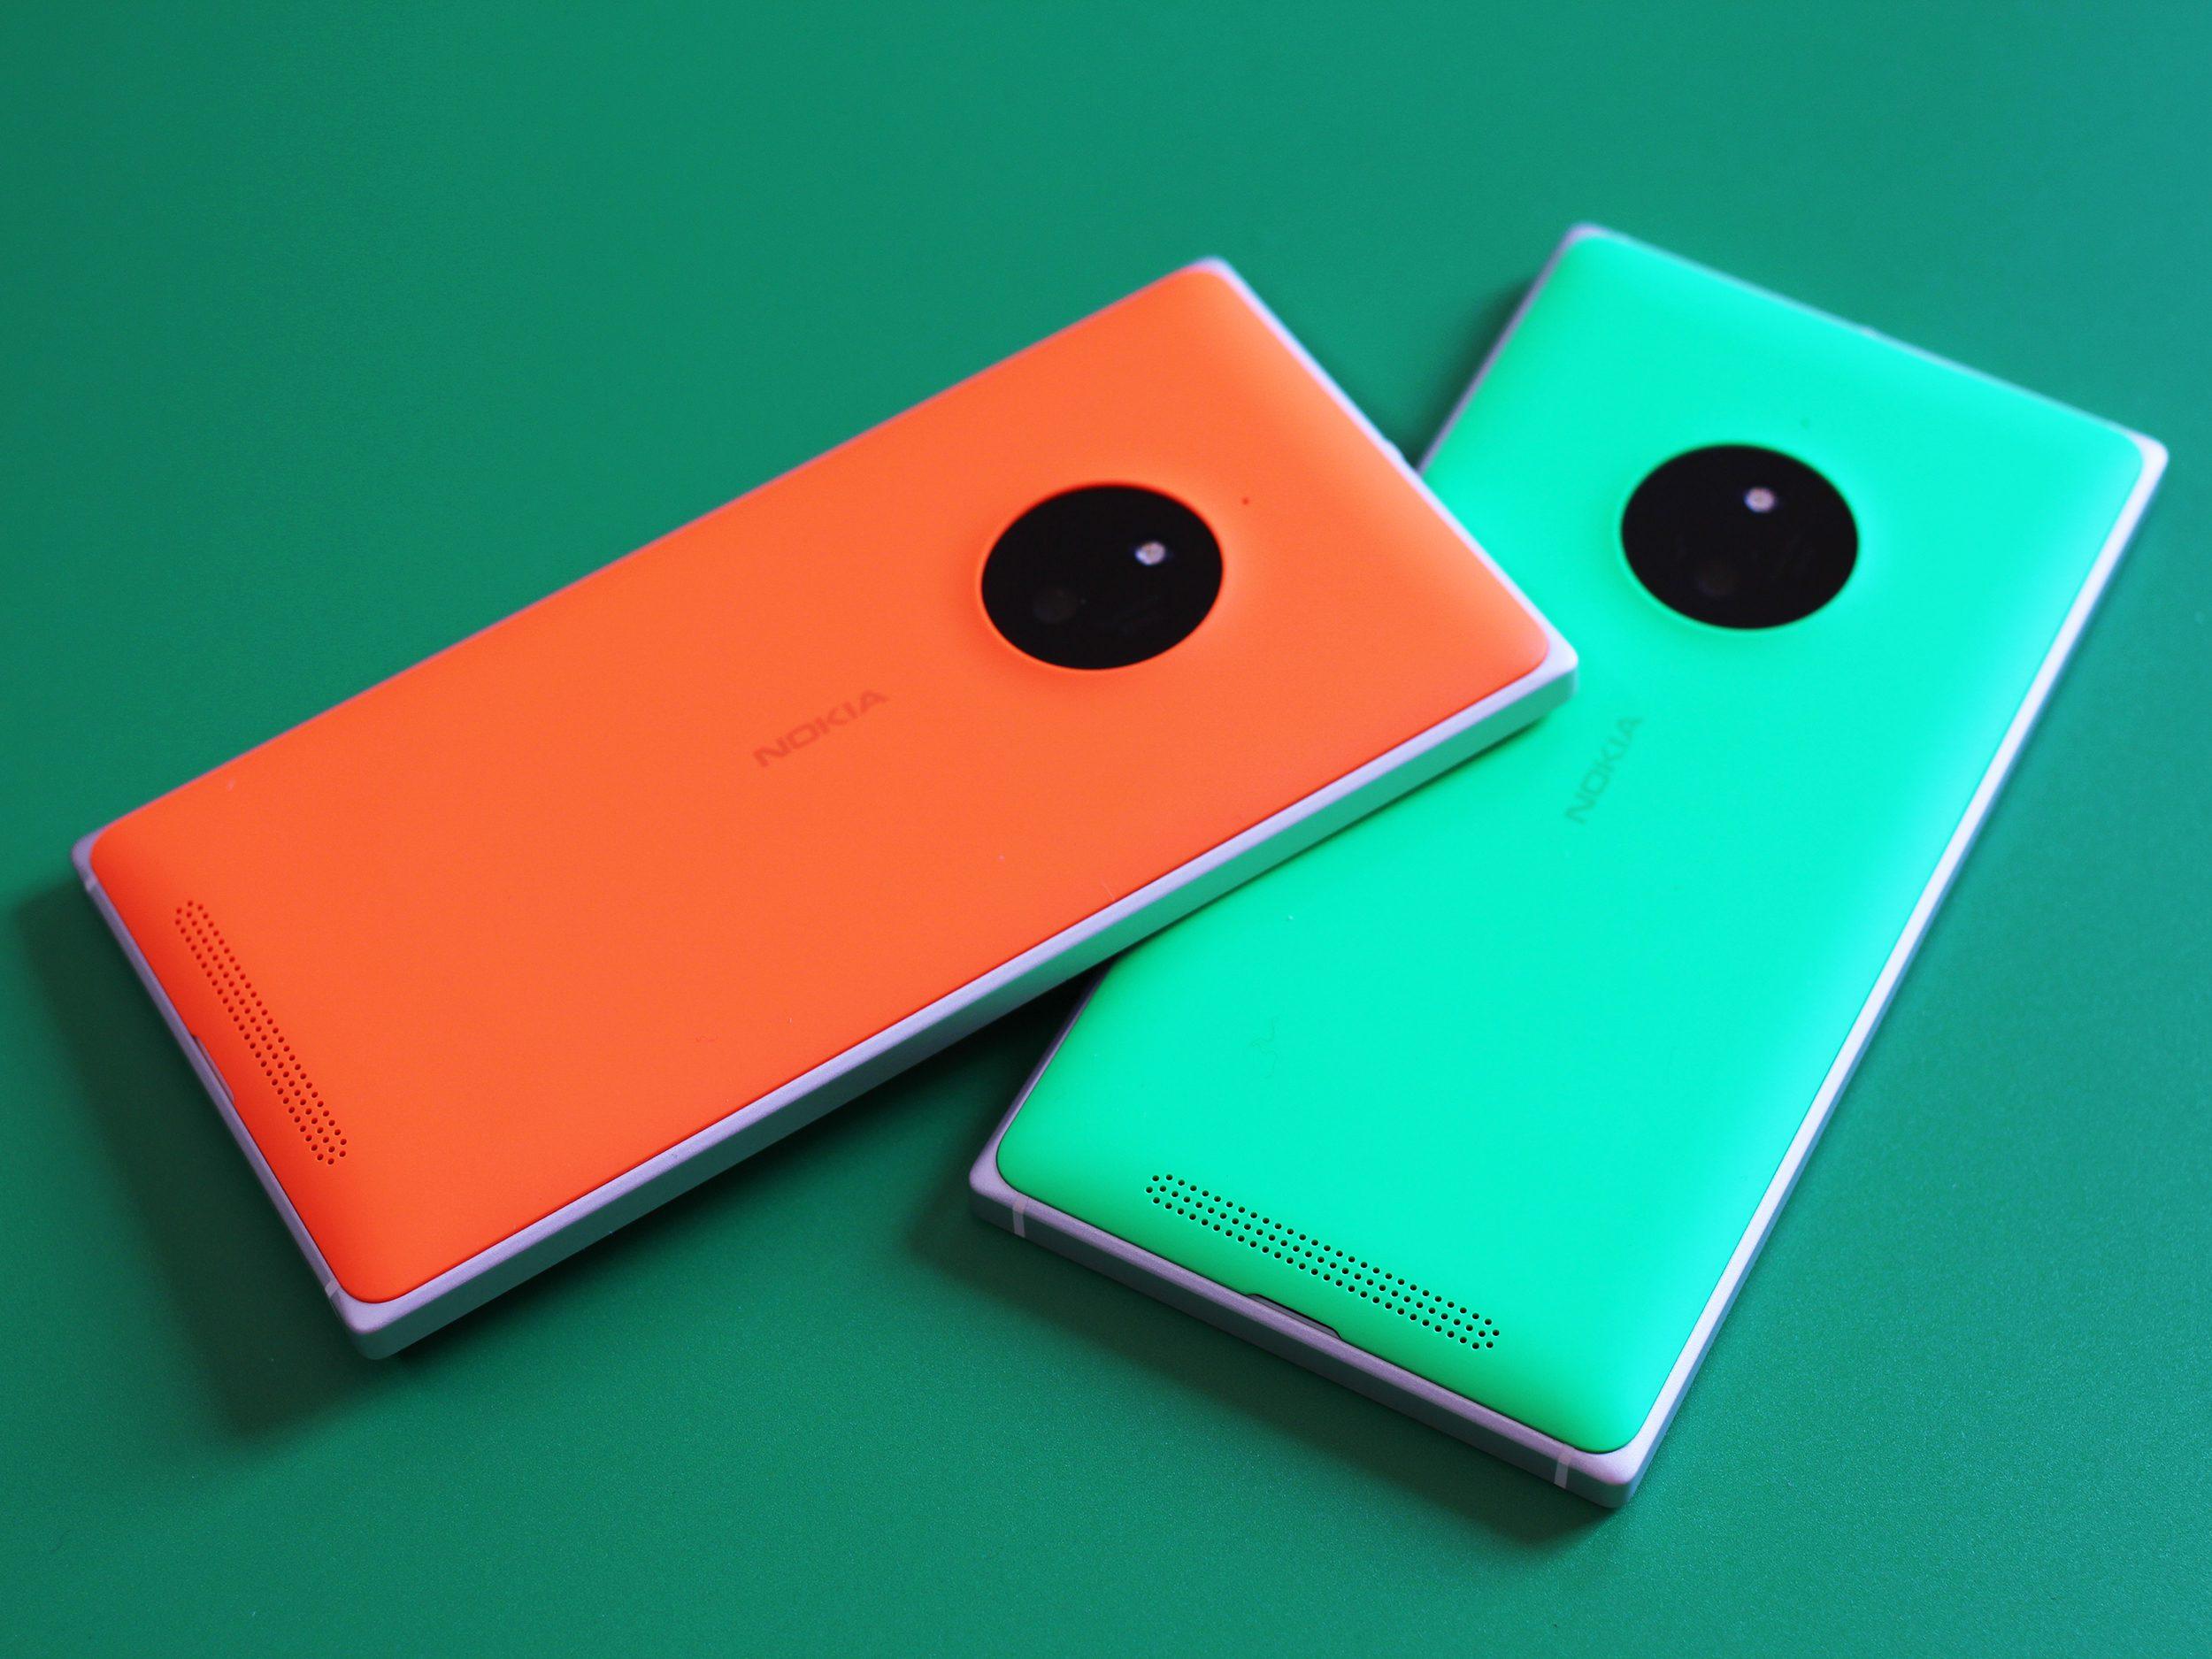 Nokia lumia 830 reviews - Nokia Lumia 830 Has A Serious Manufacturing Flaw Stay Alert While Buying Mspoweruser